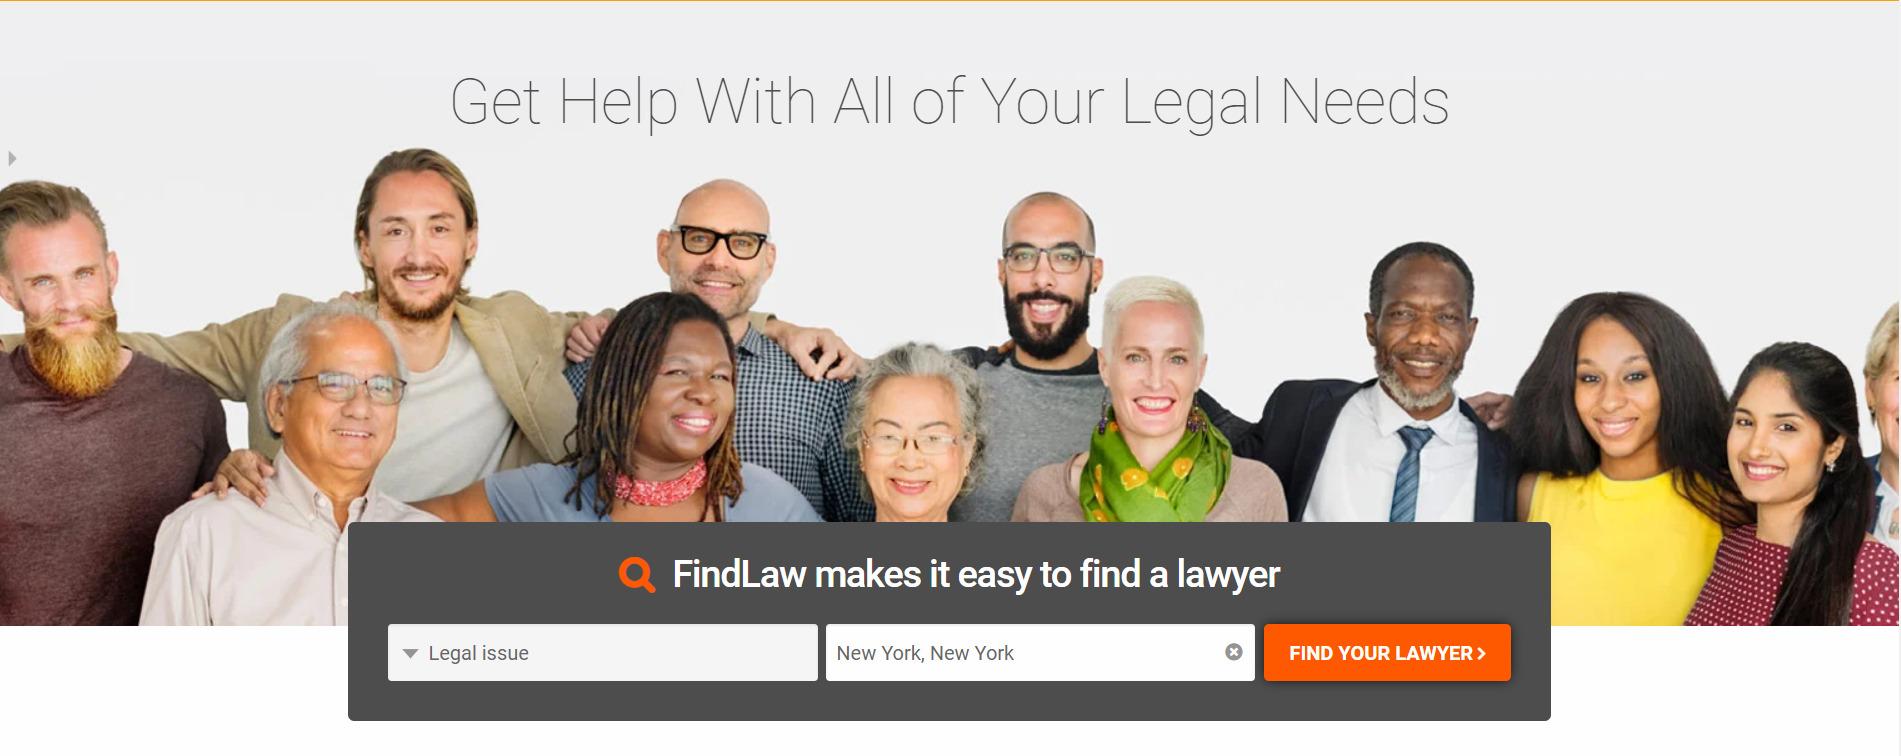 Findlaw Homepage Image